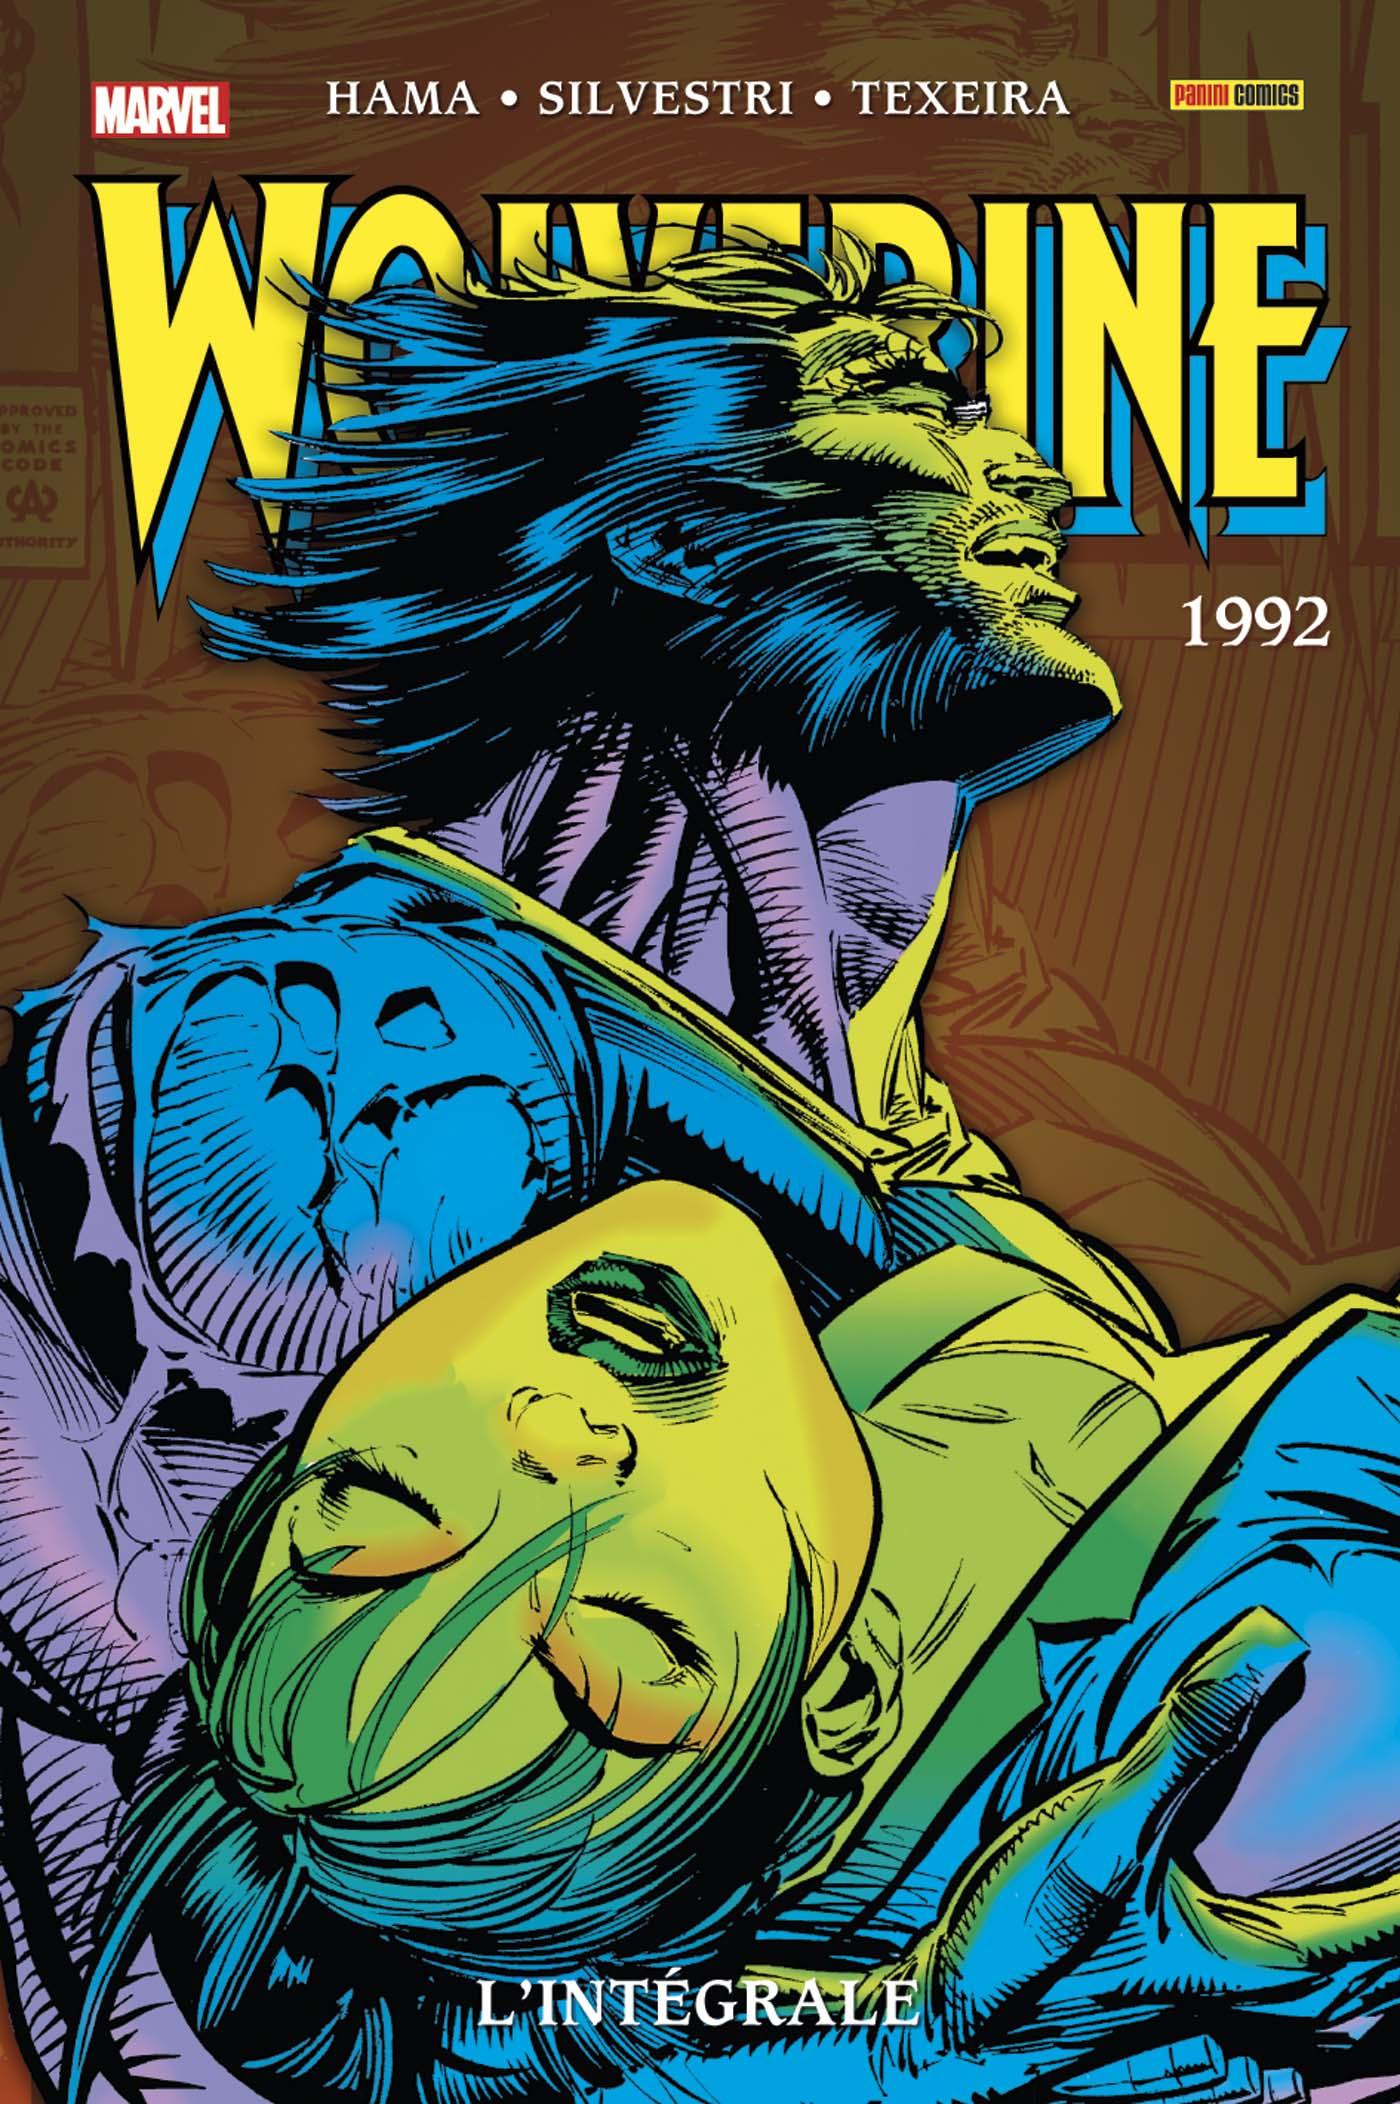 WOLVERINE : L'INTEGRALE 1992 (TOME 5 NOUVELLE EDITION)(VF)